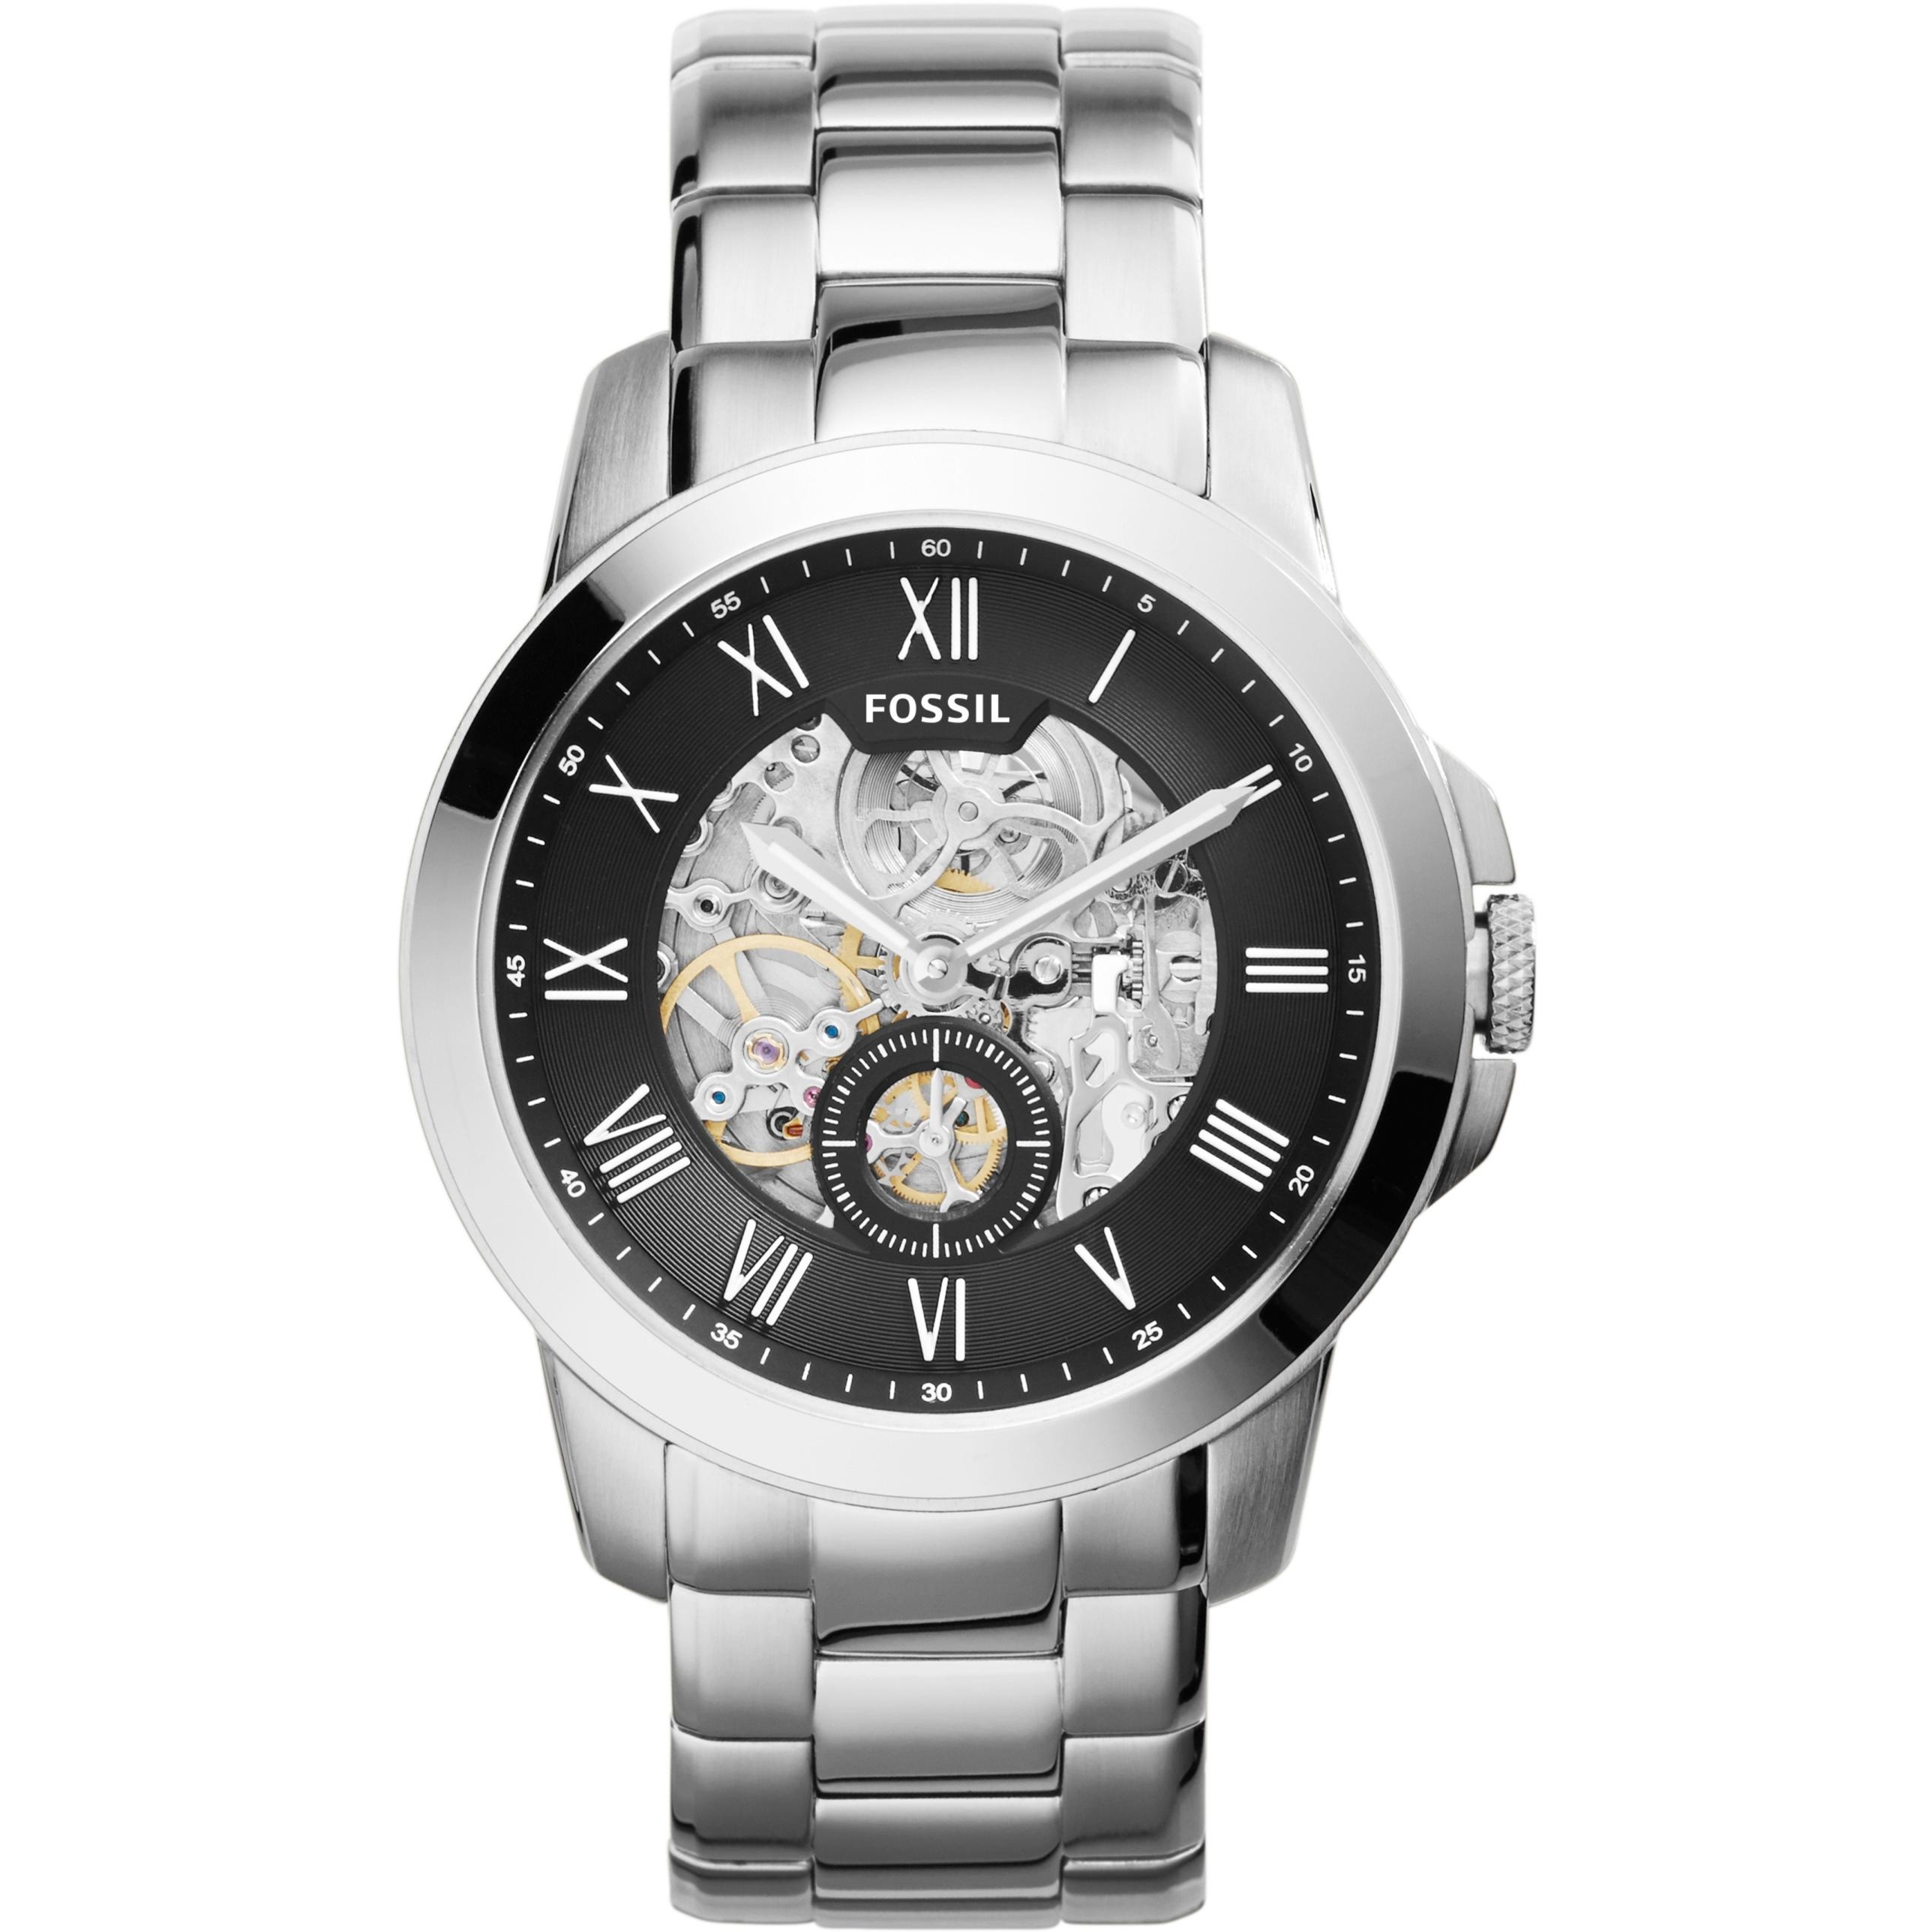 Fossil Grant Automatik Fl13 Startupjobsfa Me3138 Sport Automatic Skeleton Dial Black Leather Watch Am Besten Gents Me3055 Watchshopcom Bj78